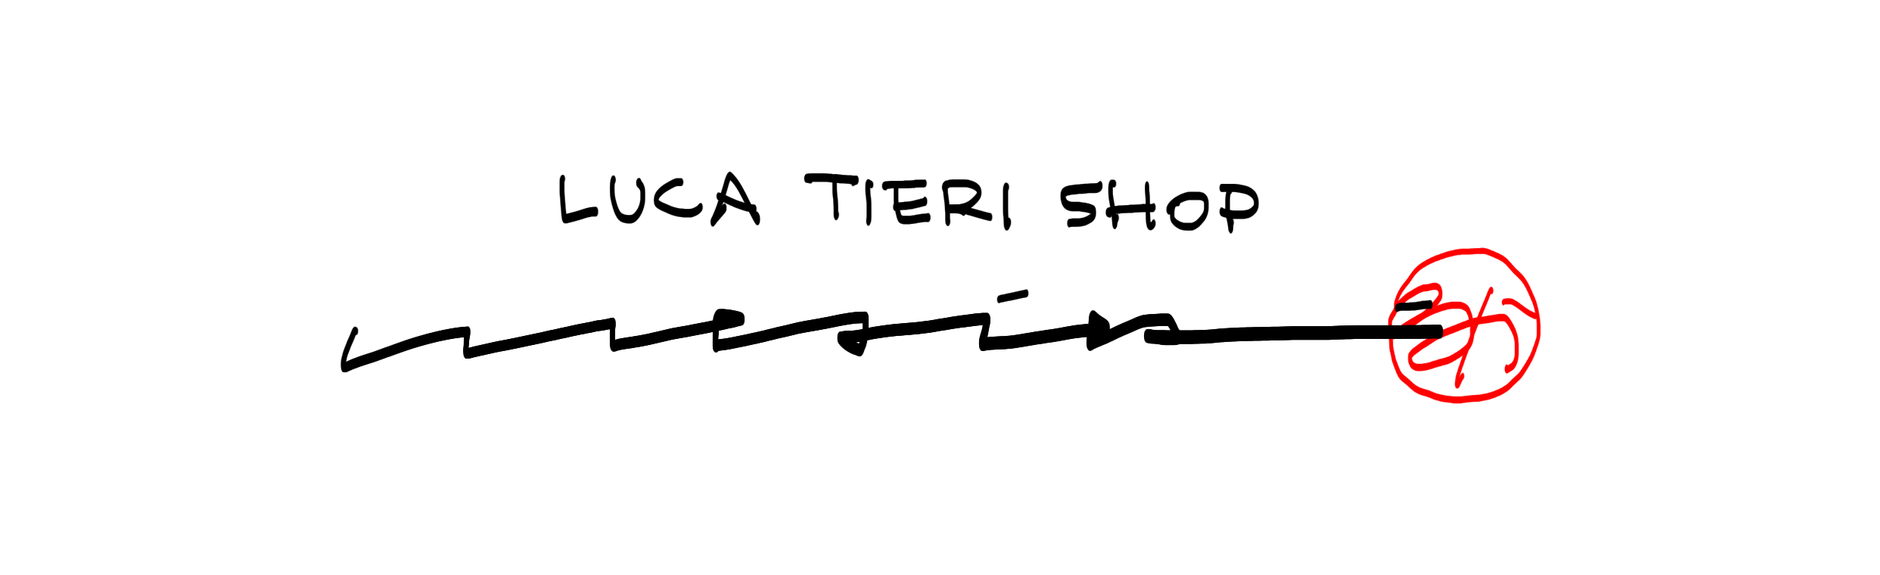 LUCA TIERI SHOP(閉鎖中)